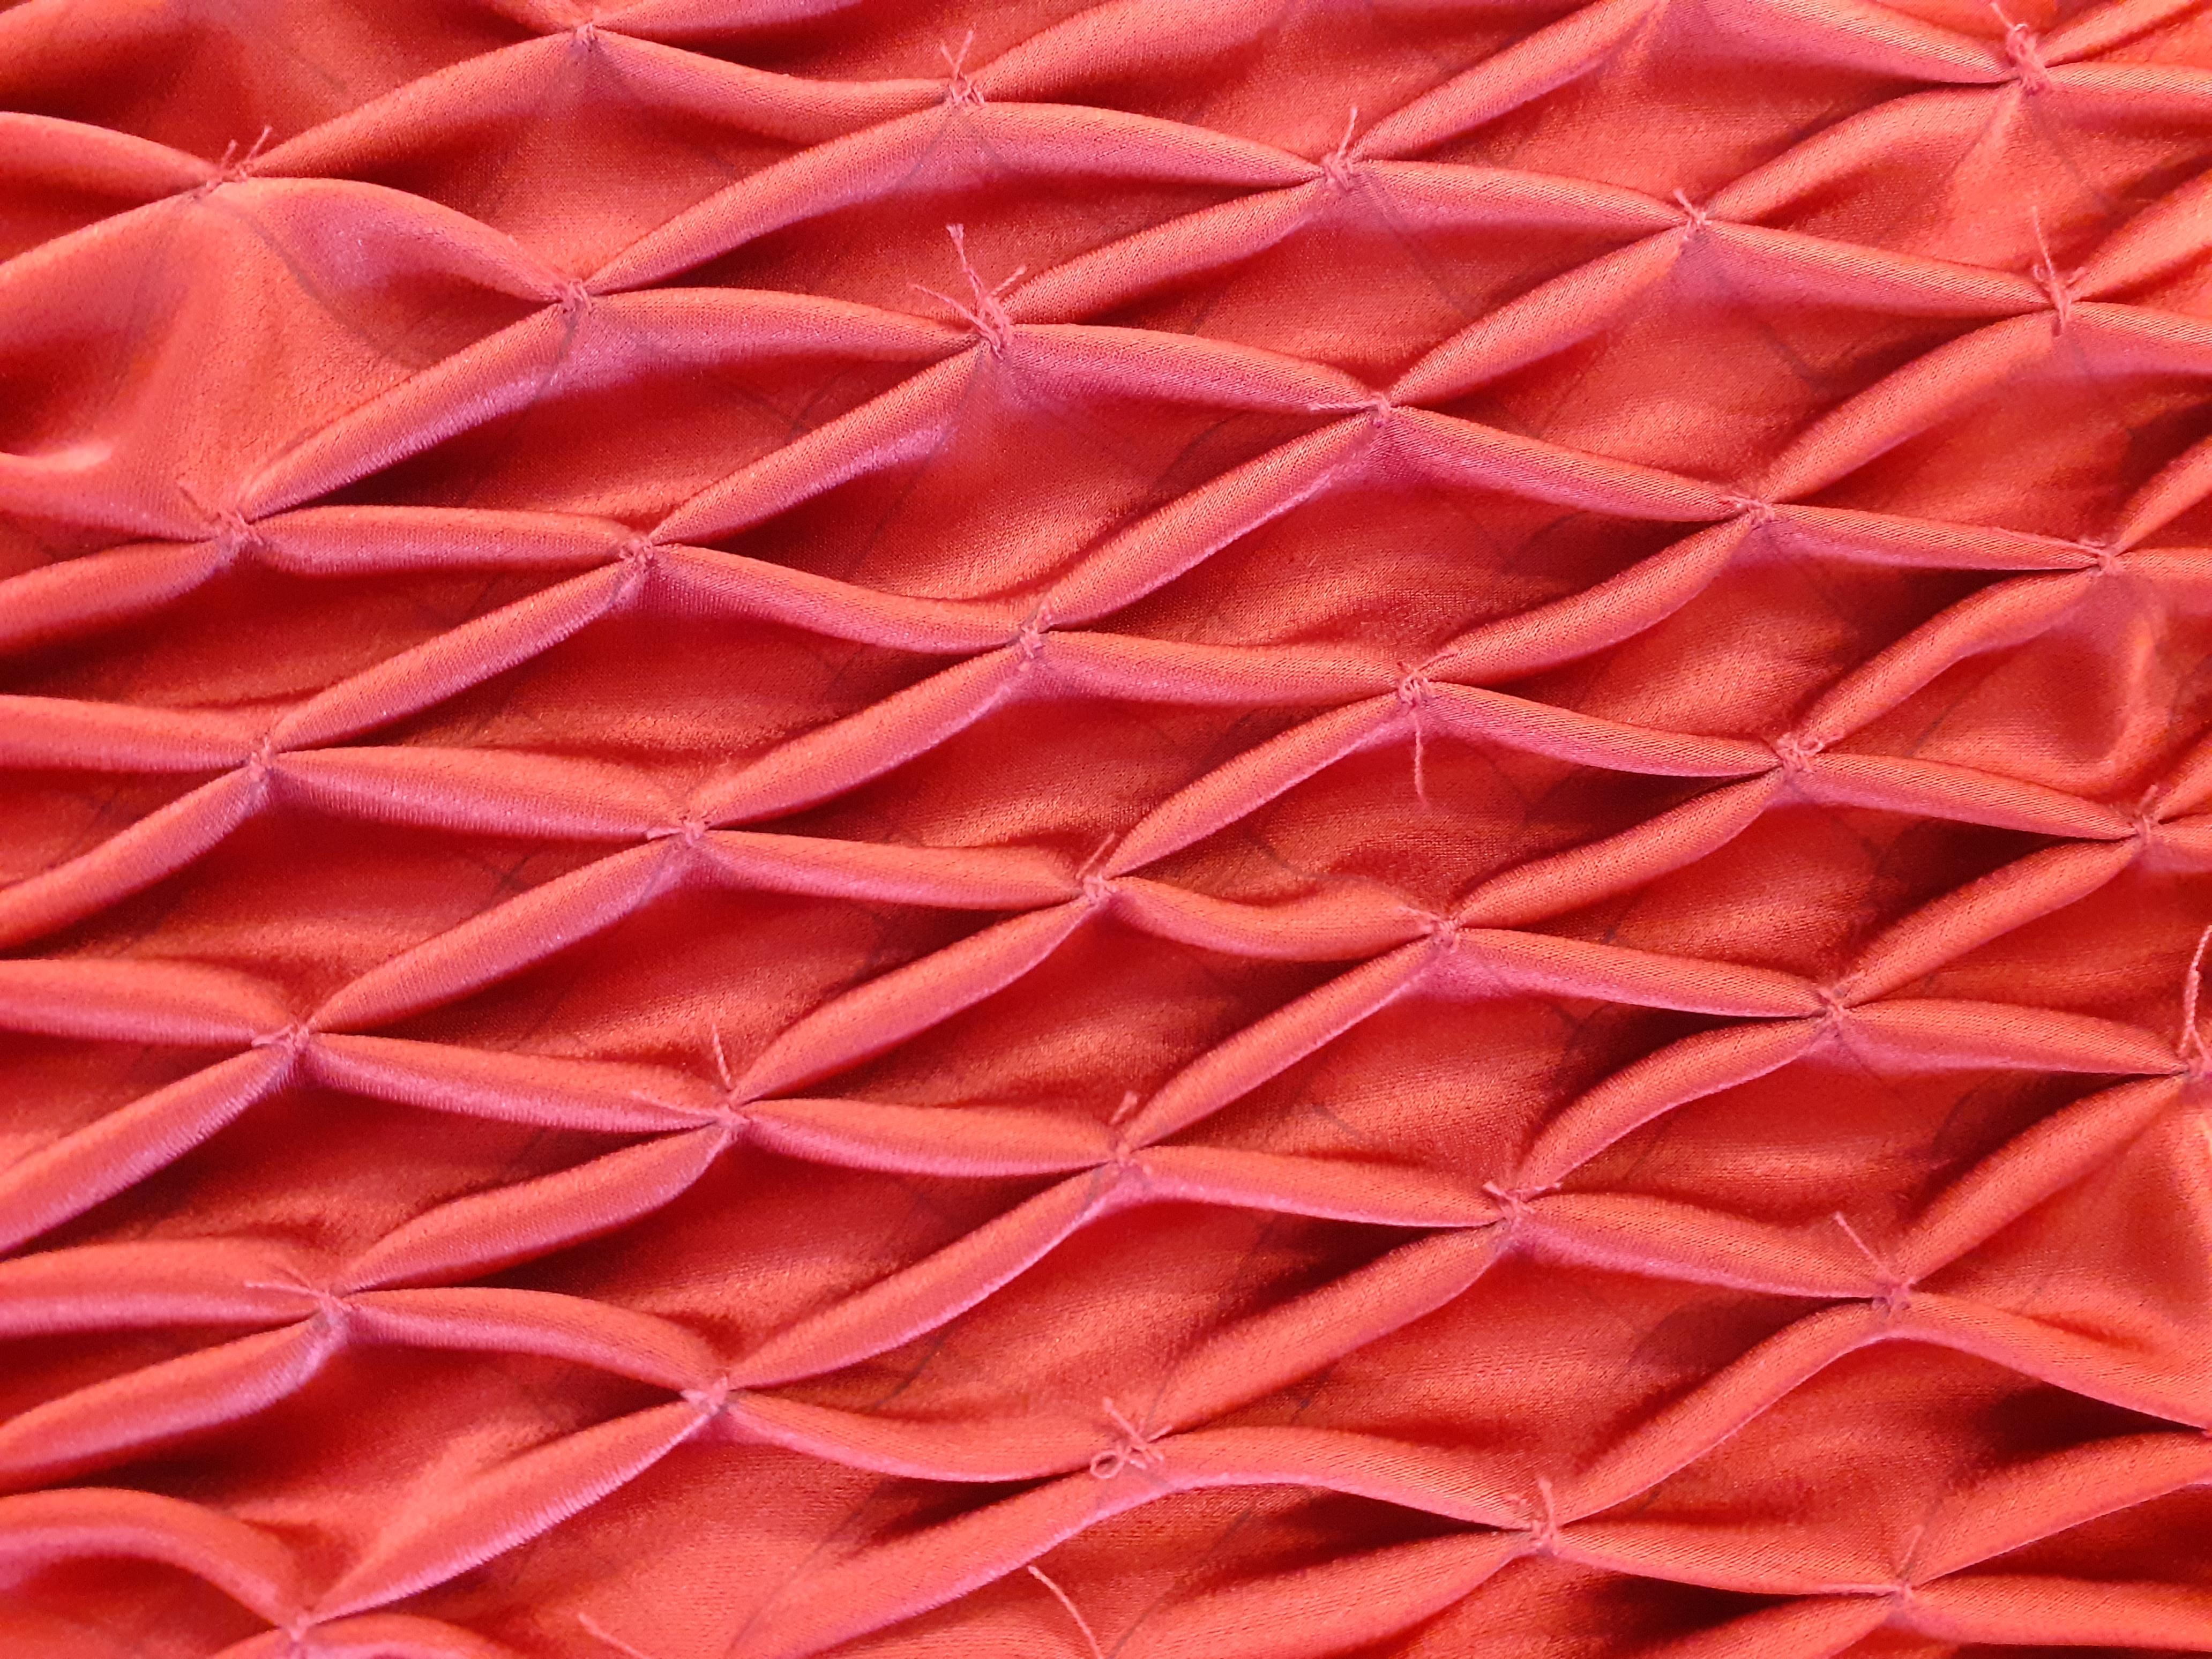 manipulations tissu.jpg